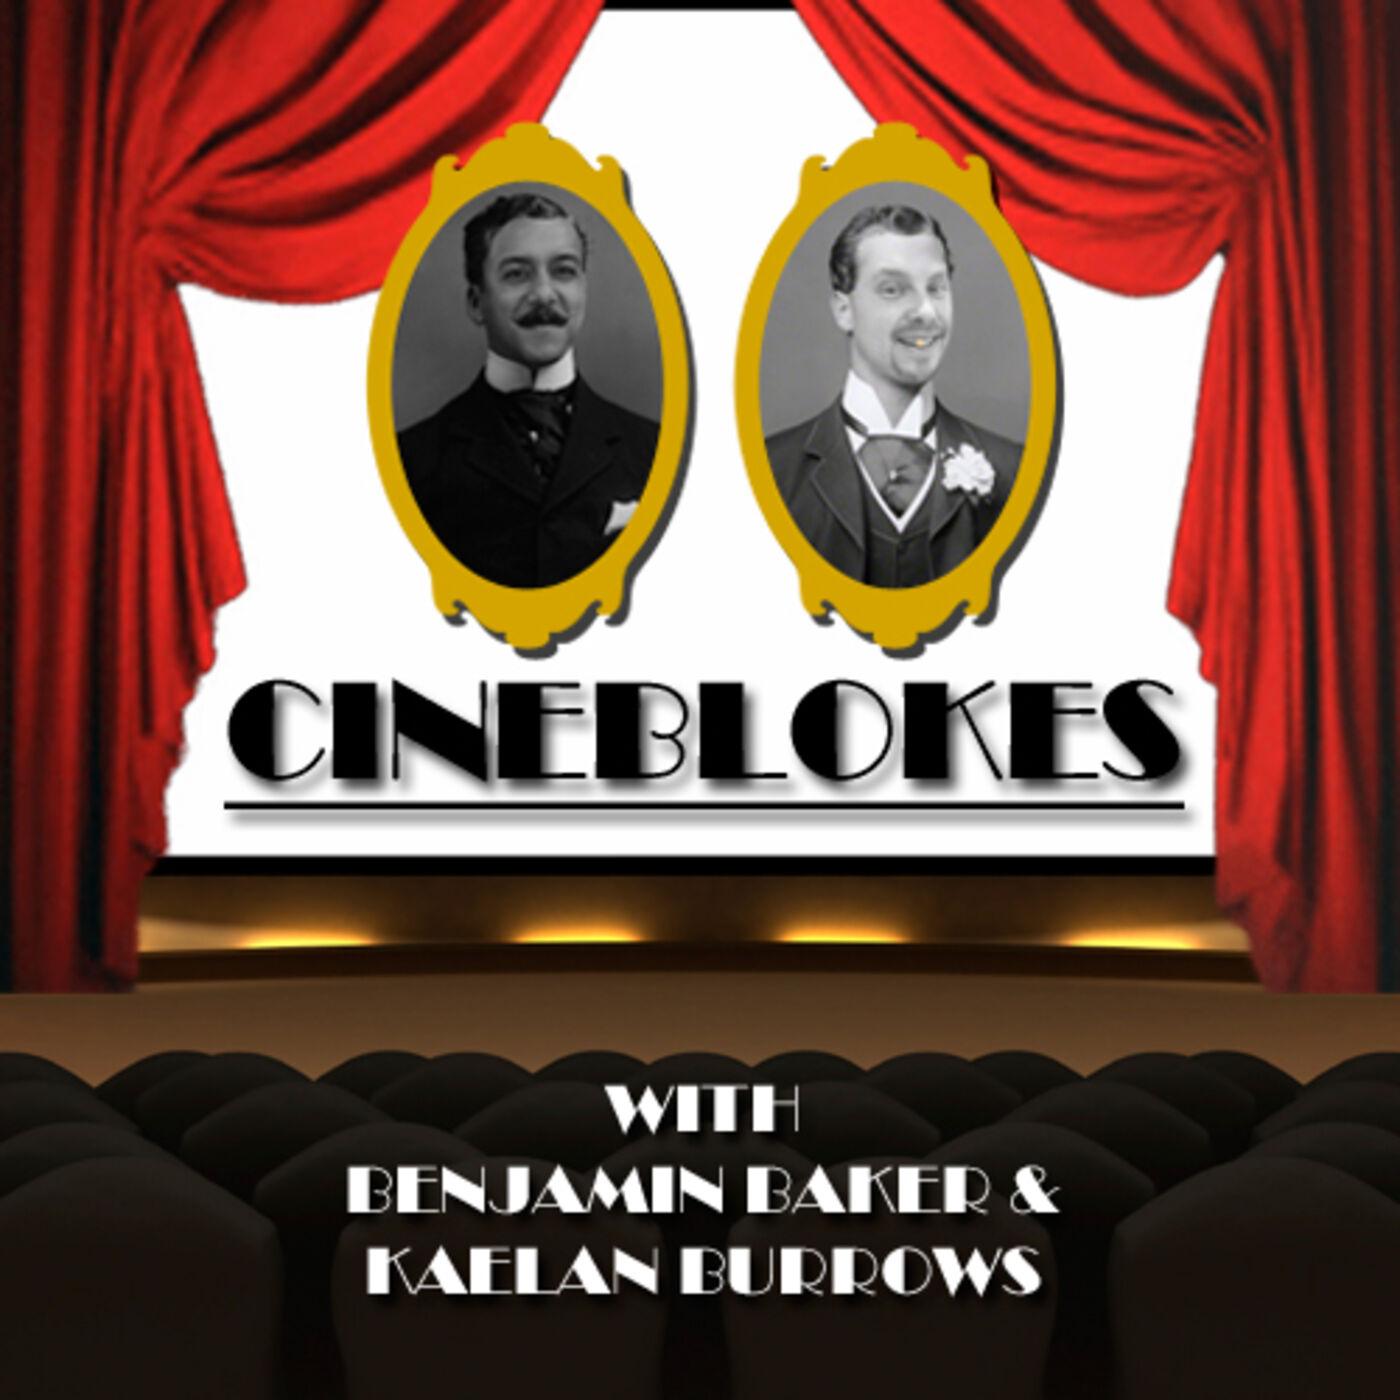 Cineblokes Episode 143 - Snake Eyes: G.I. Joe Origins